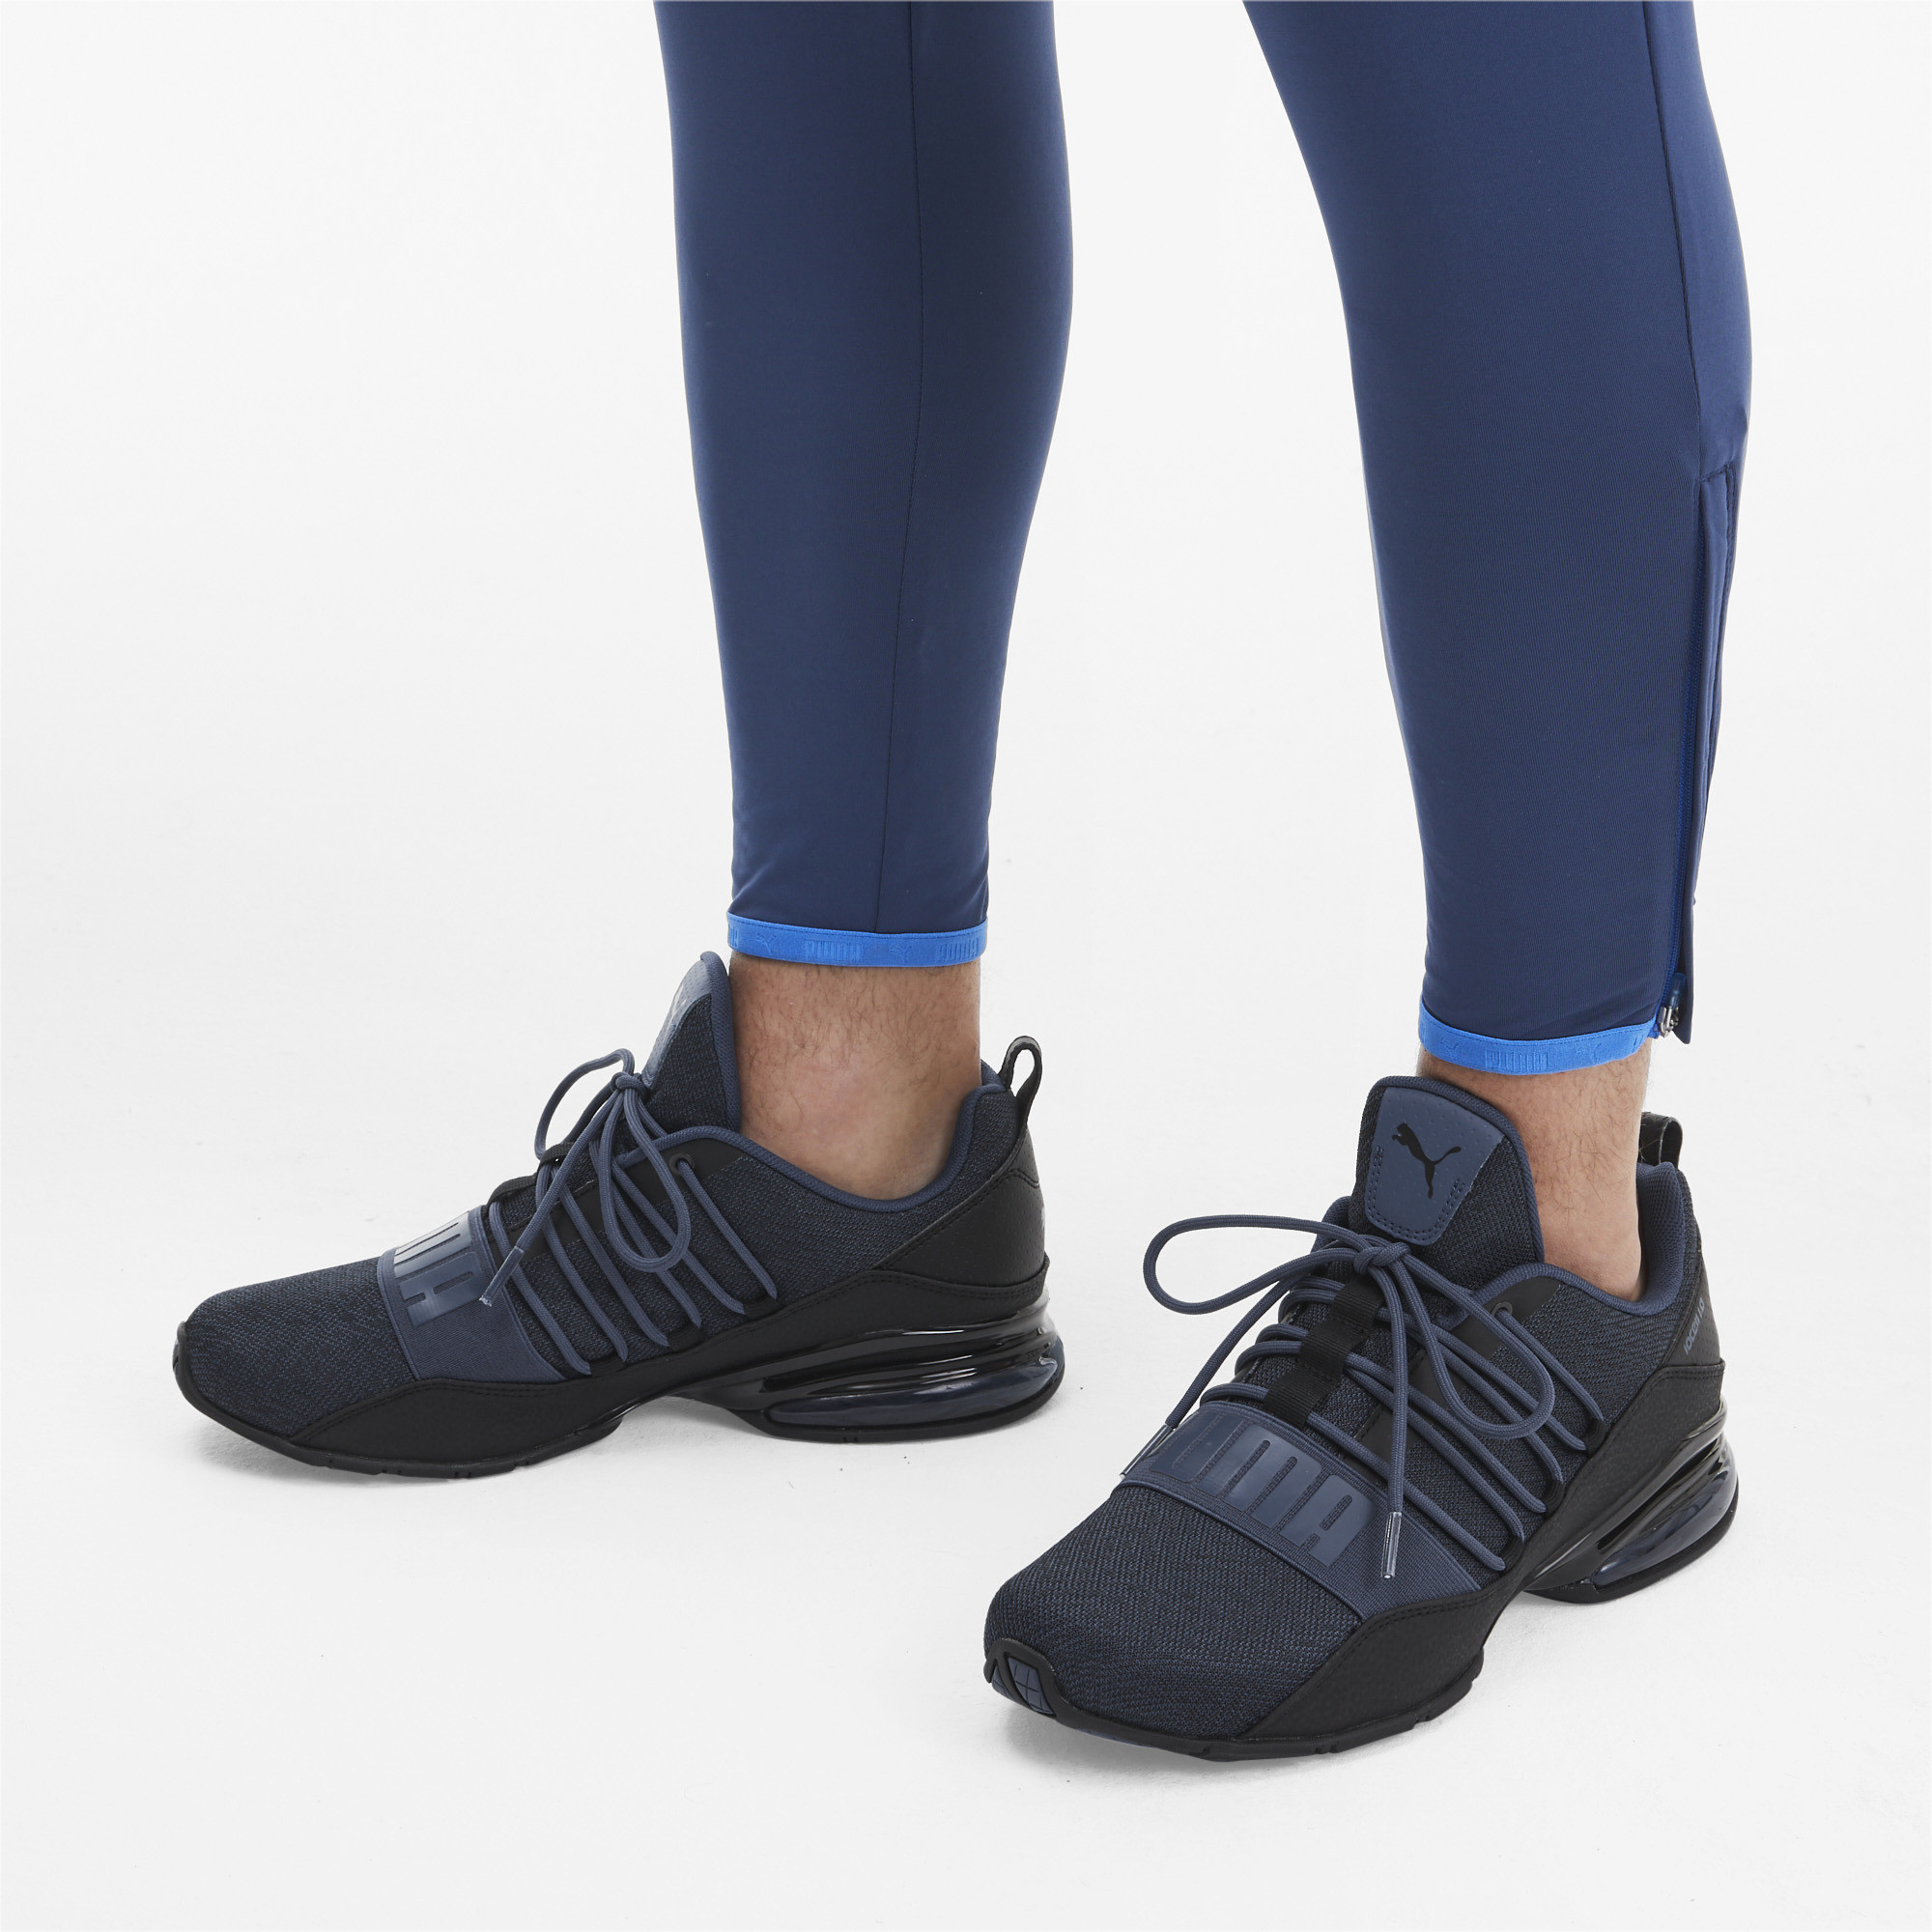 PUMA-Men-039-s-CELL-Regulate-Bold-Training-Shoes thumbnail 5